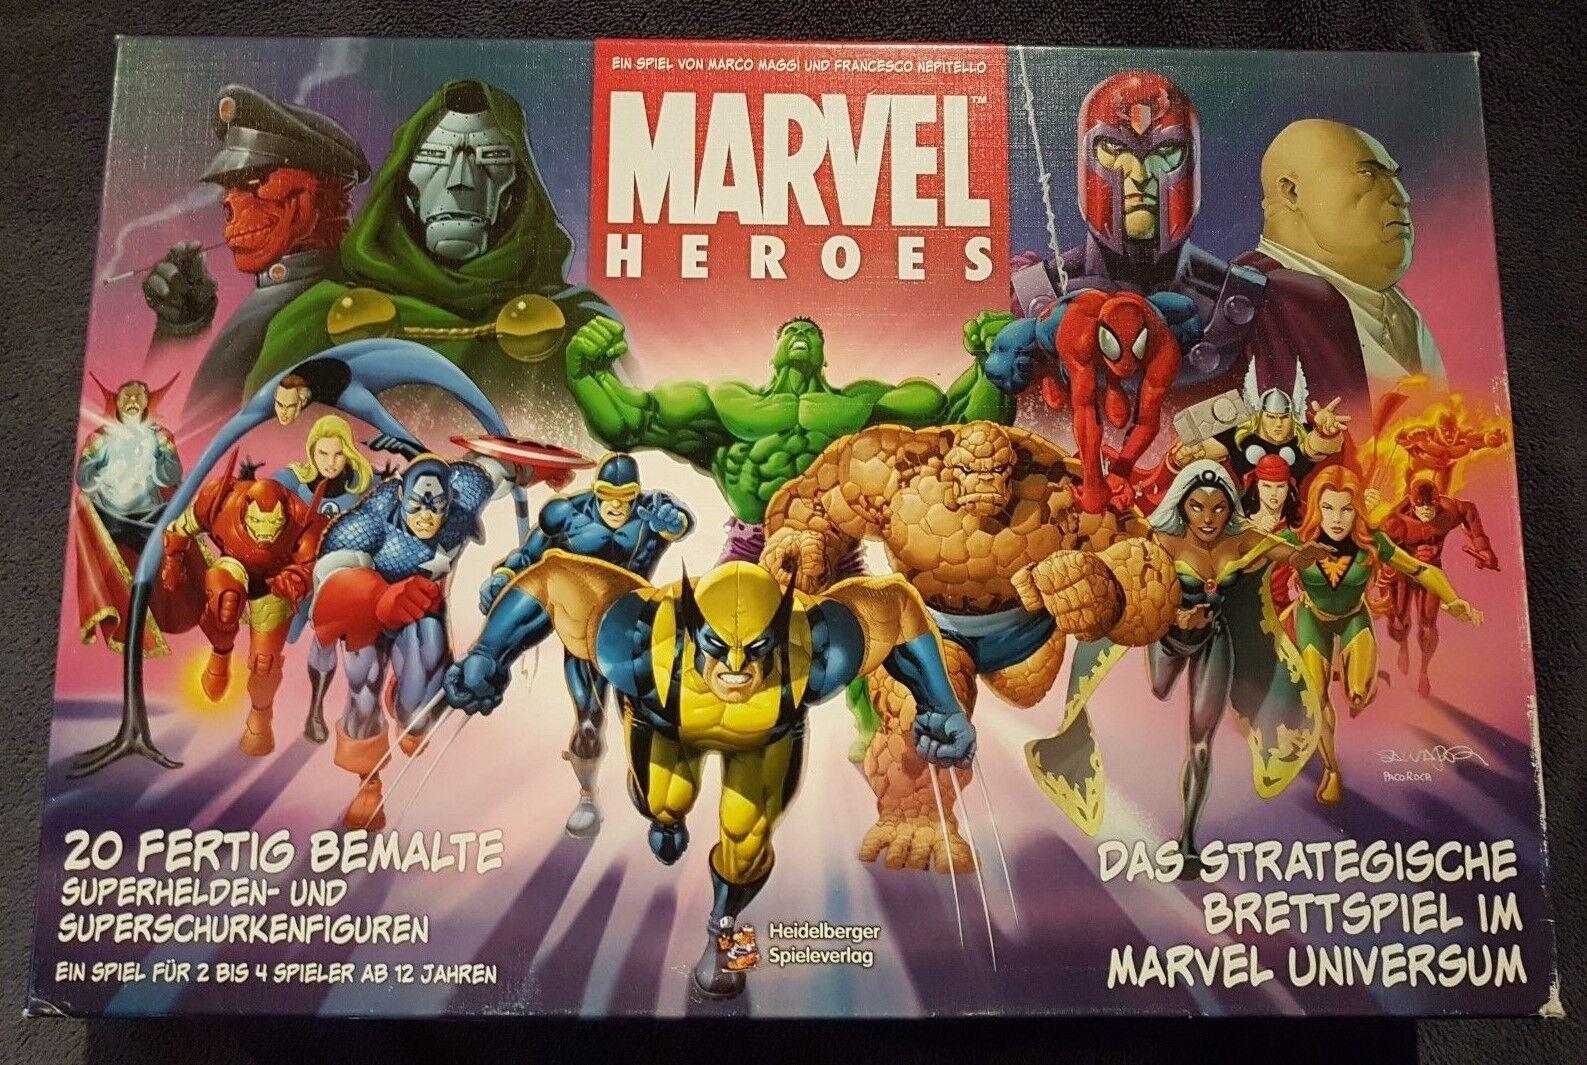 Marvel Marvel Marvel Heroes vom Heidelberger Spieleverlag b910a4